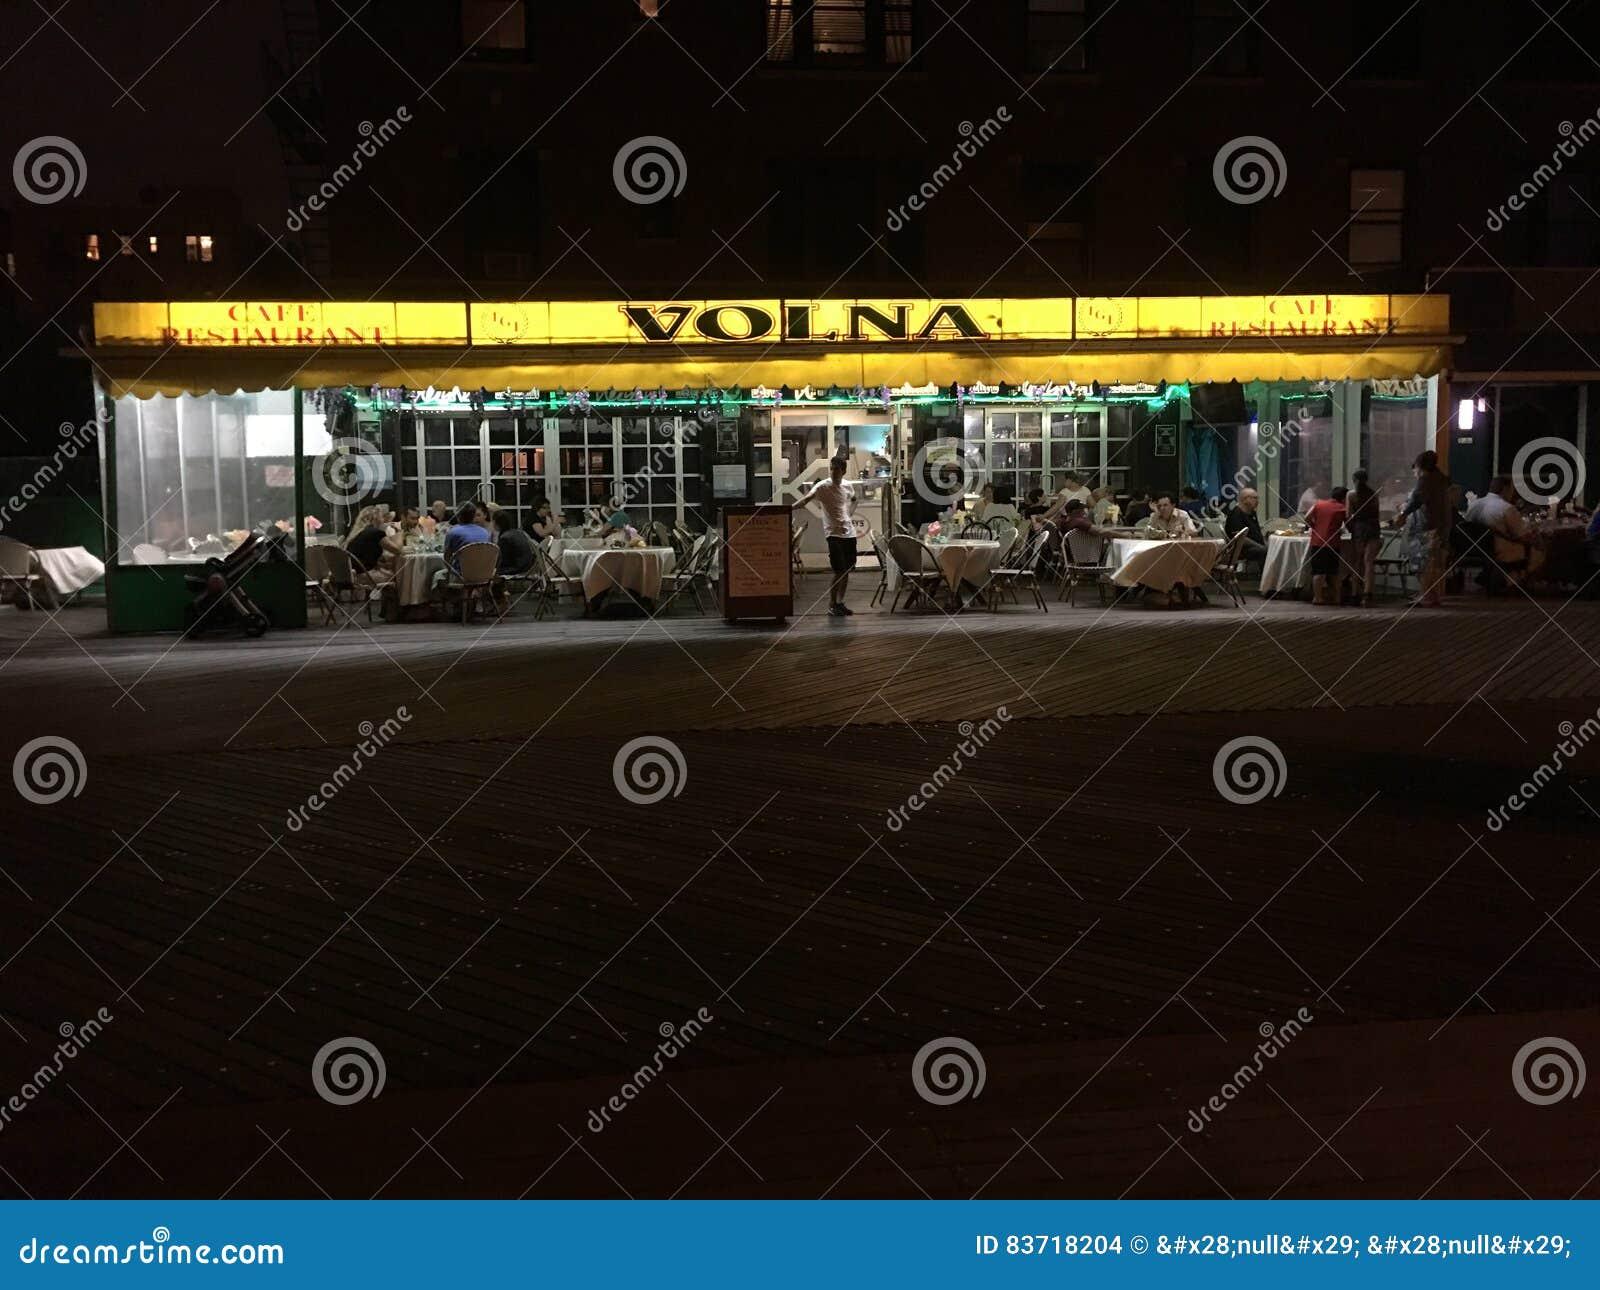 Restaurant Volna Editorial Stock Image